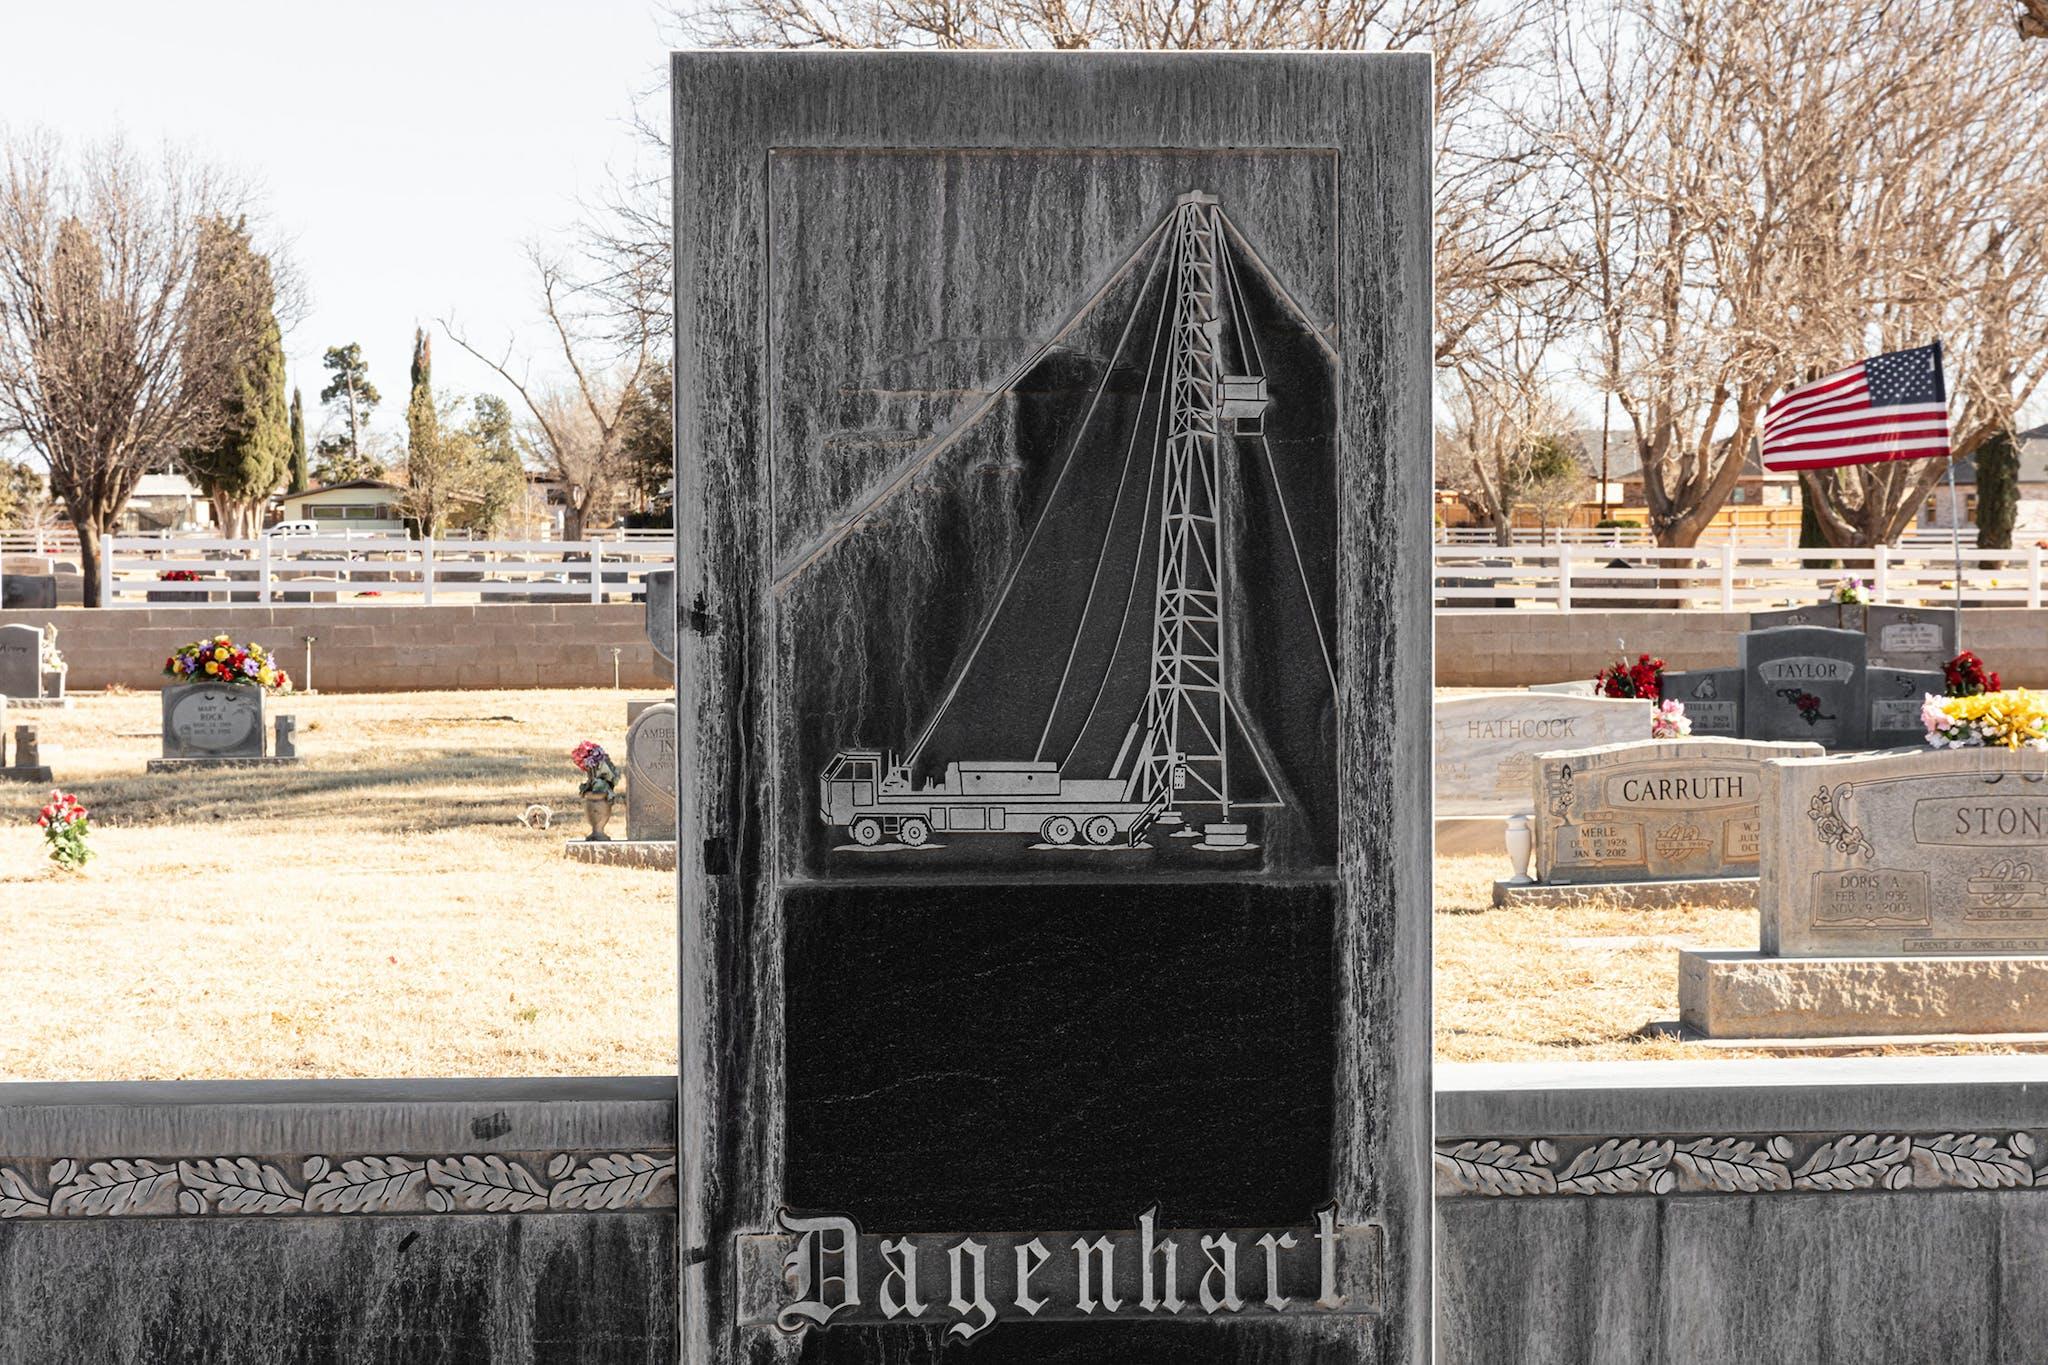 Andrews County Cemetery.